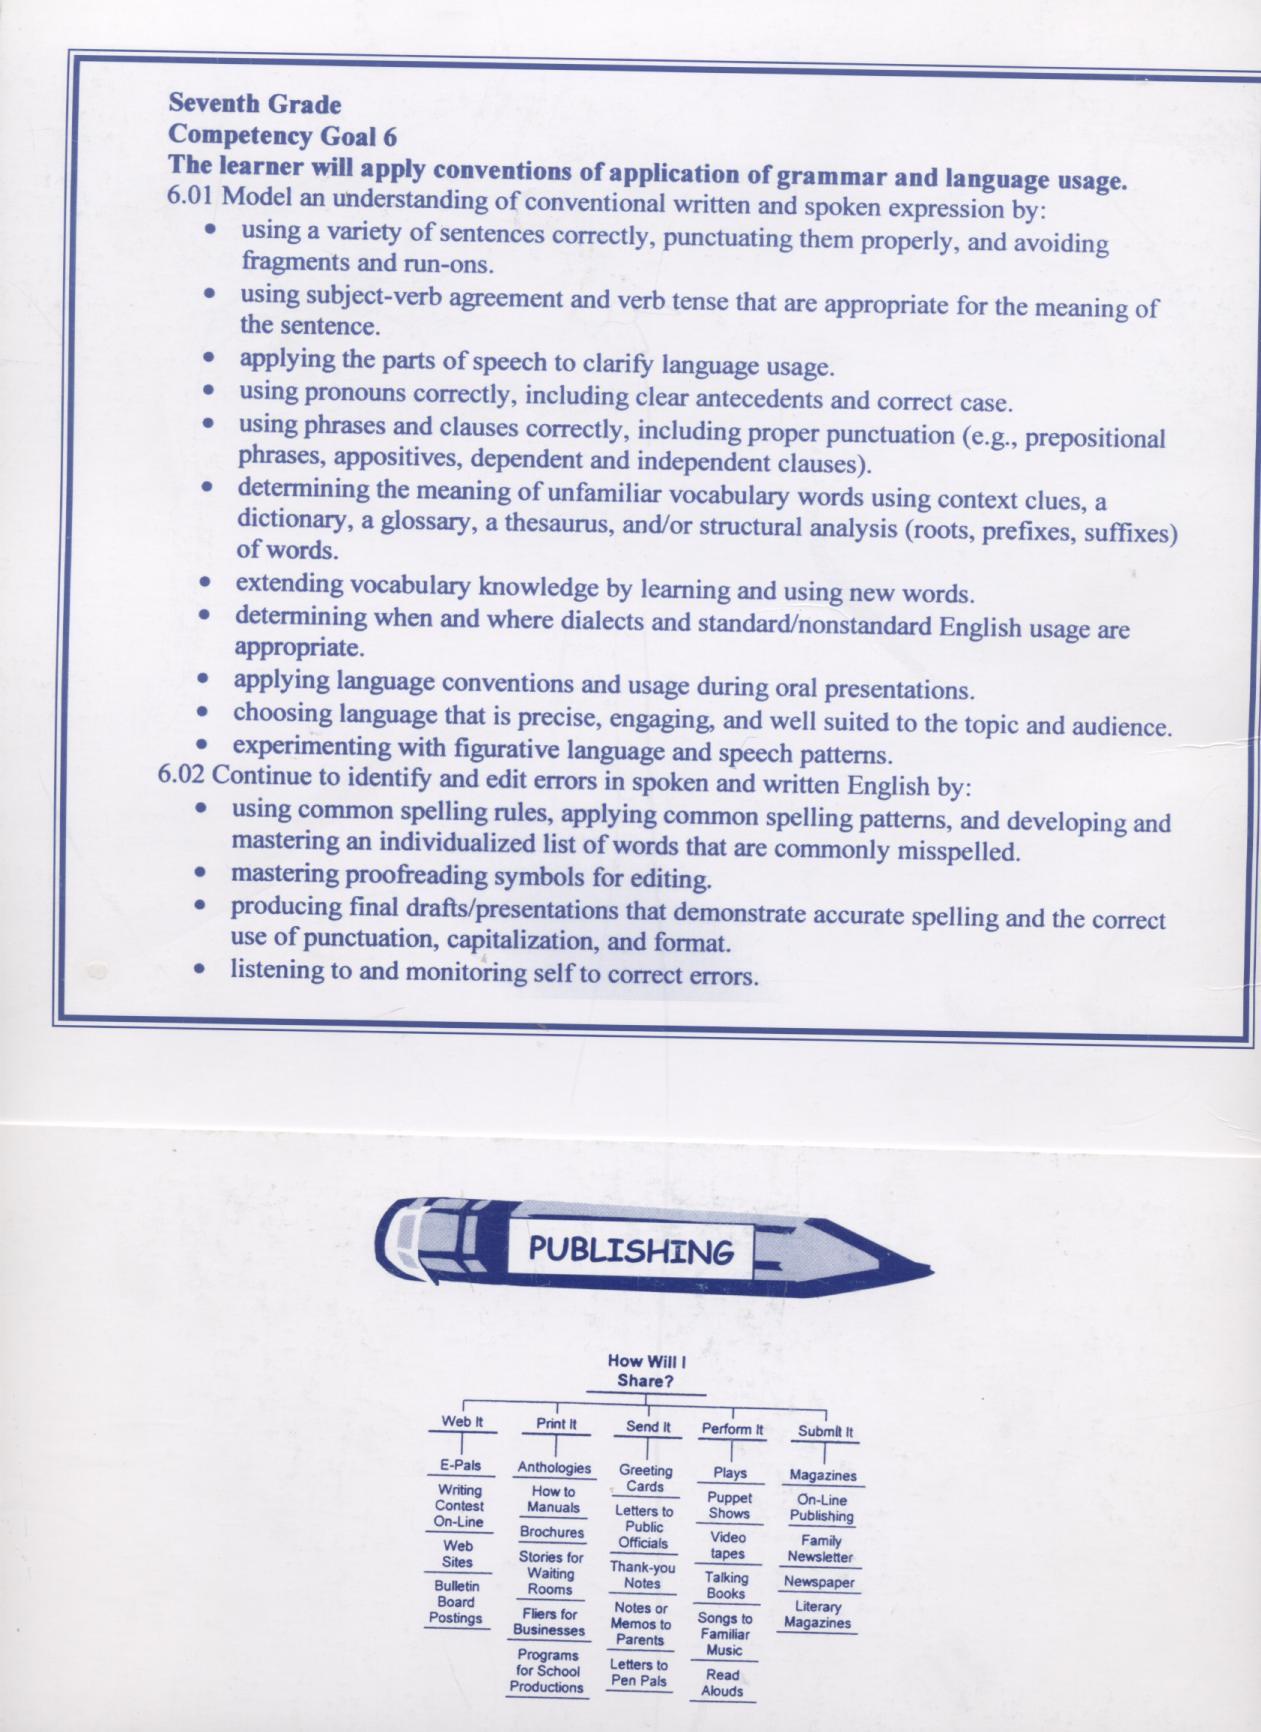 7th grade writing folder